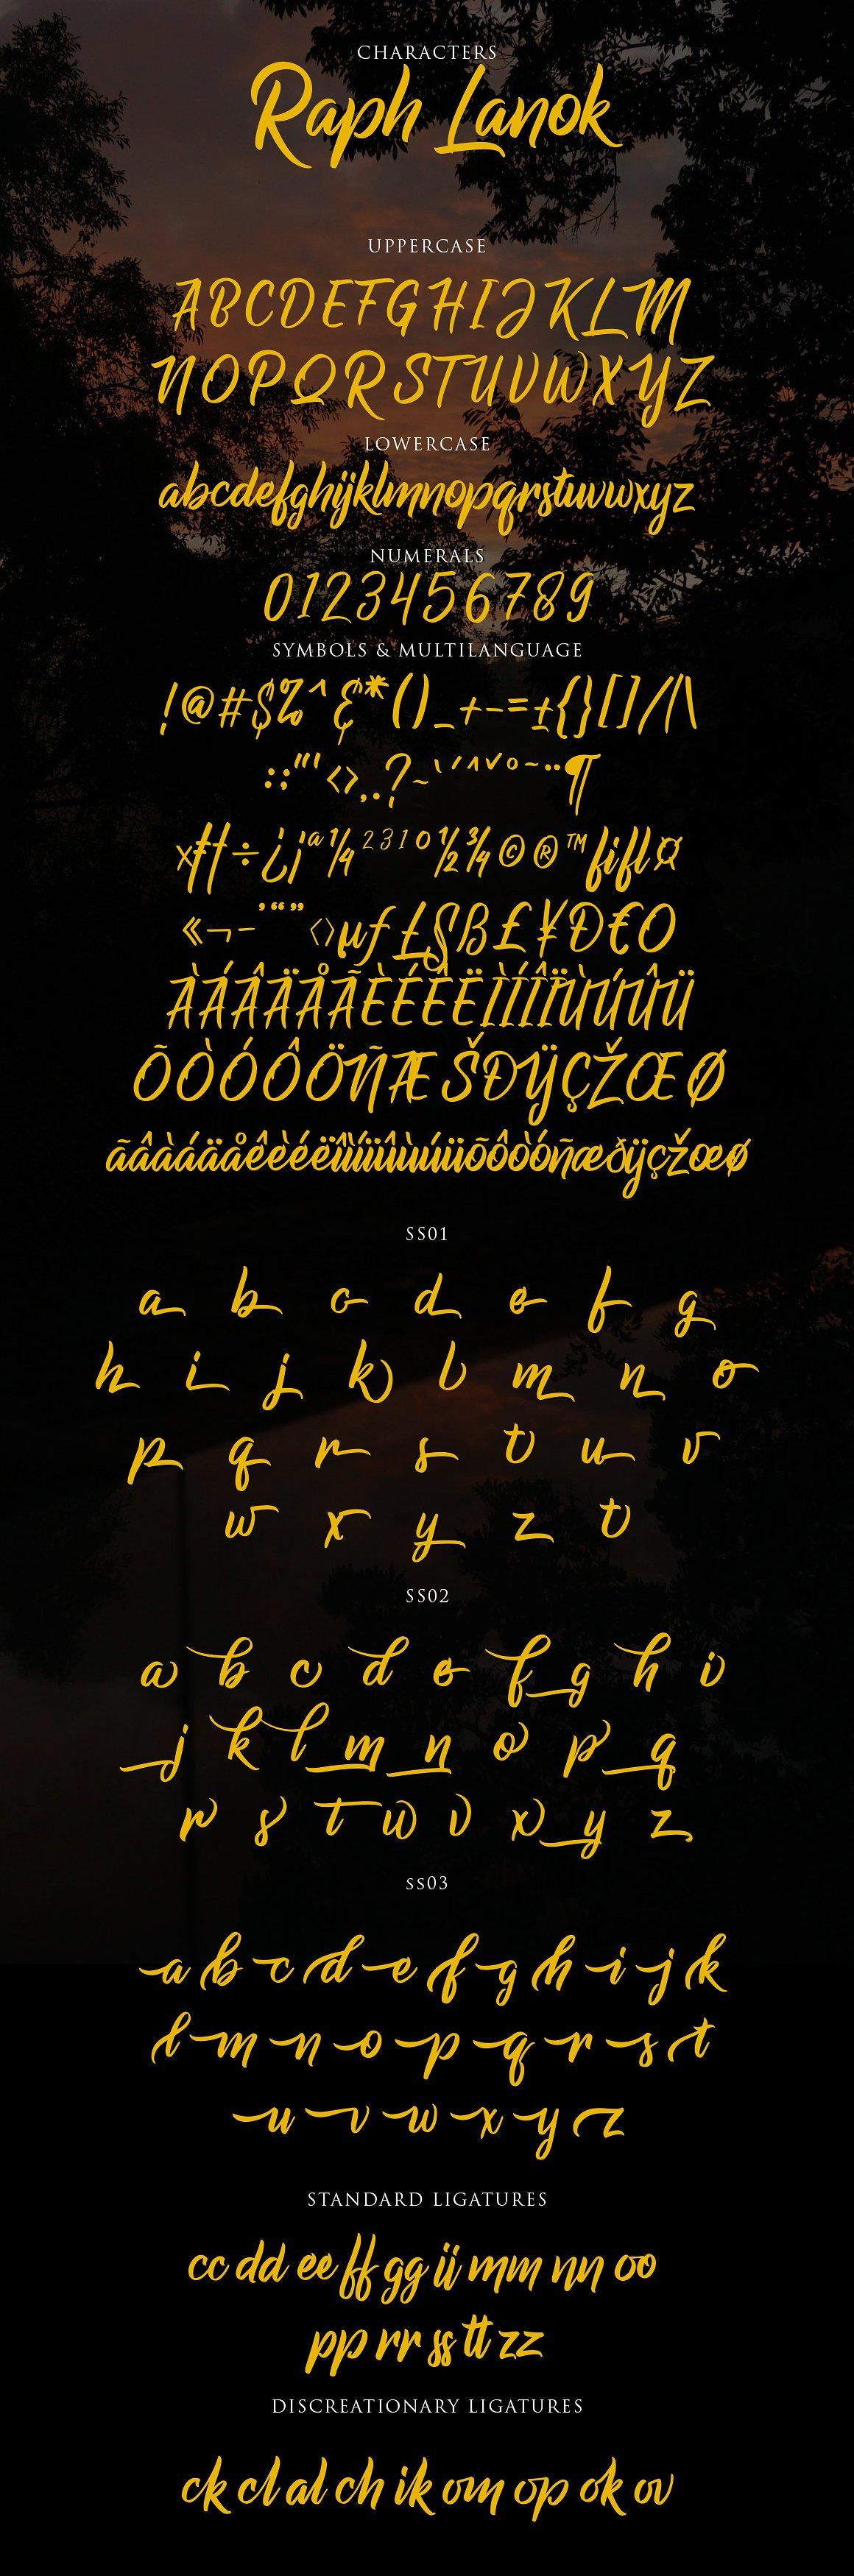 raph-lanok-script-font-1